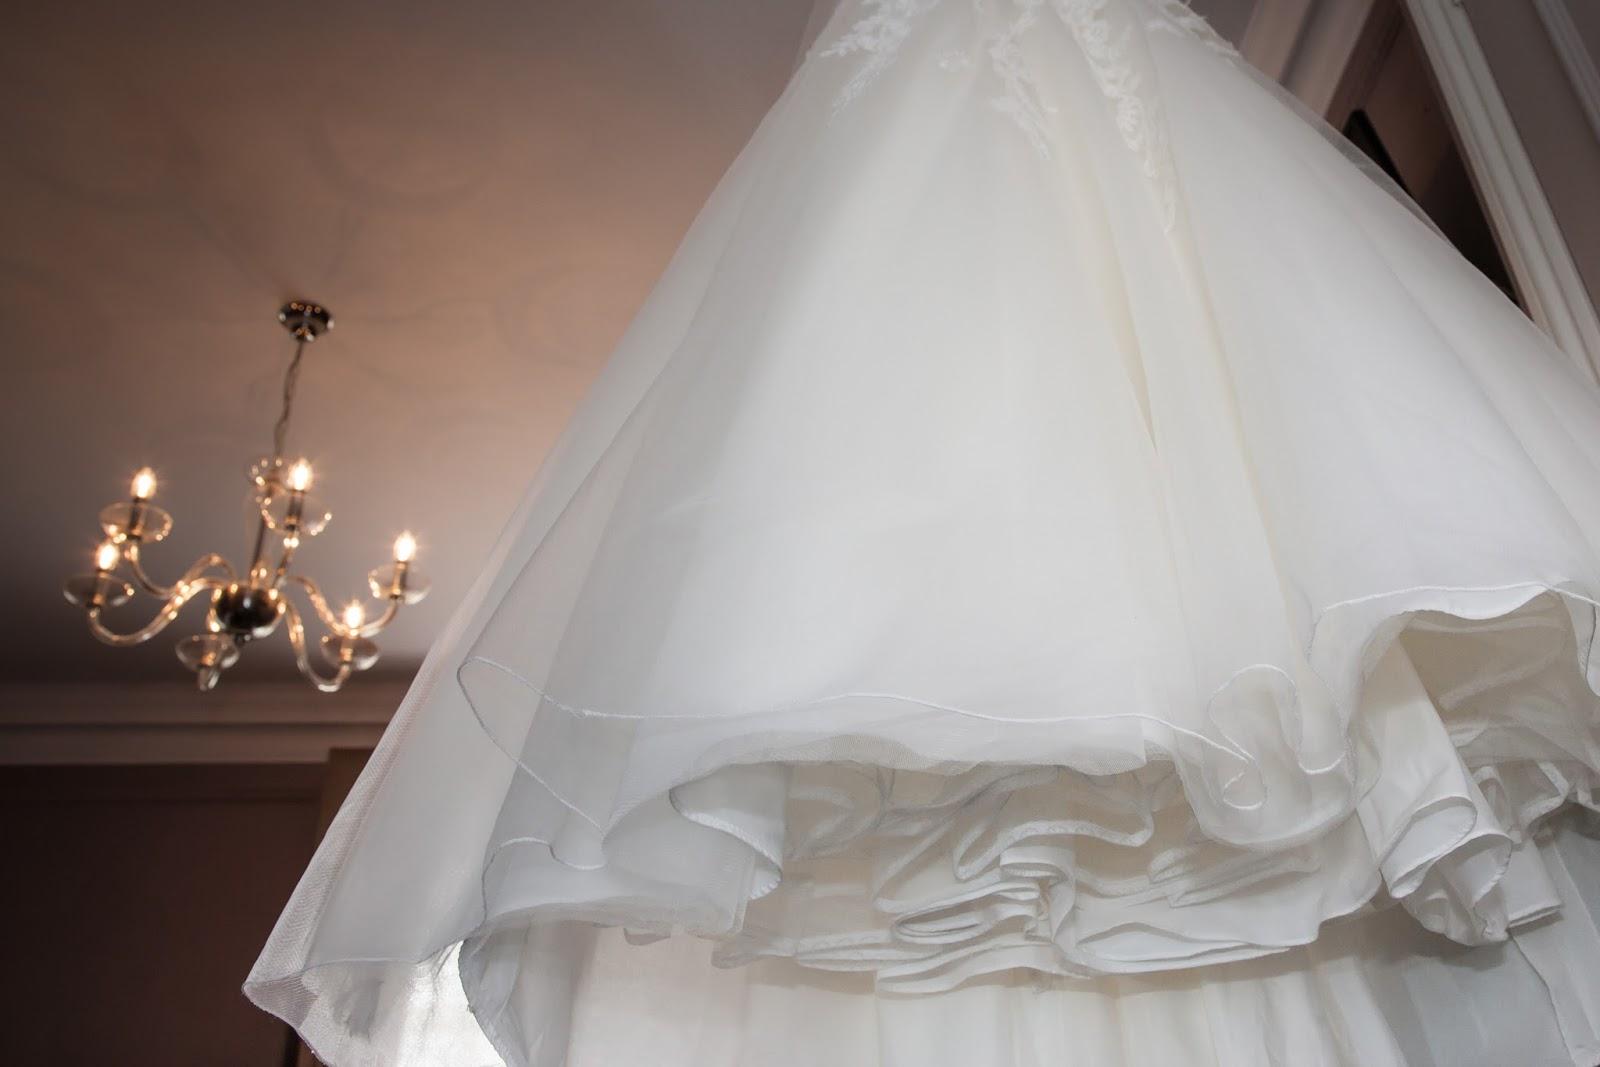 Wedding dress, morning preparations, bride, bridal